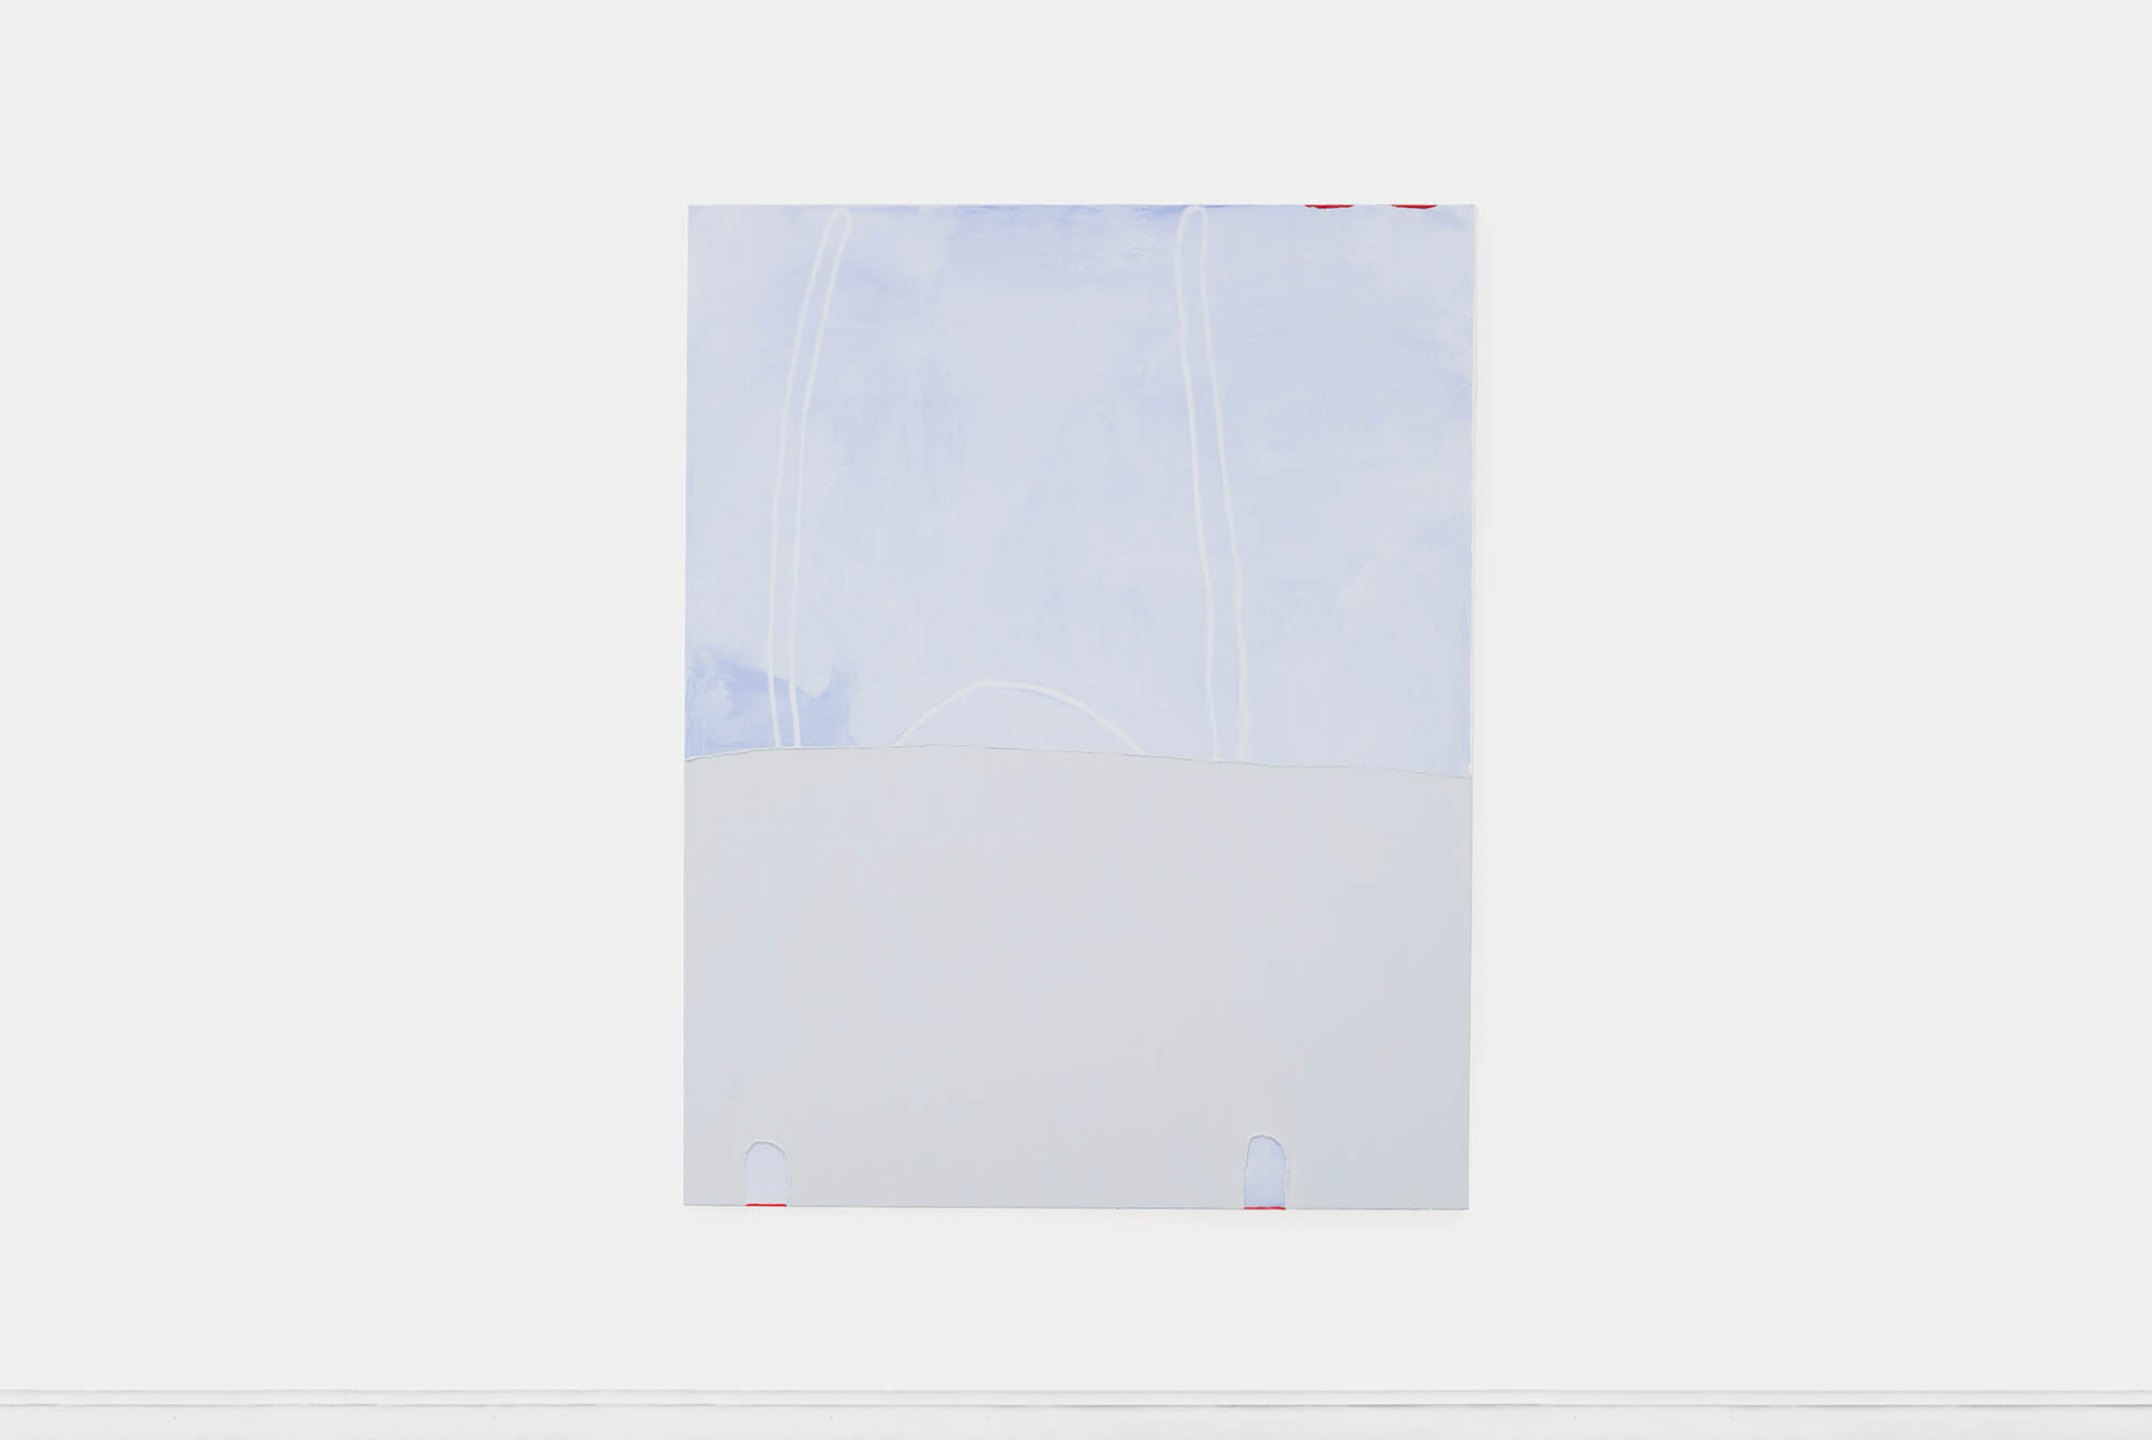 Paulo Monteiro, <em>untitled</em>, 2015, oil on canvas, 185 × 150 cm - Mendes Wood DM